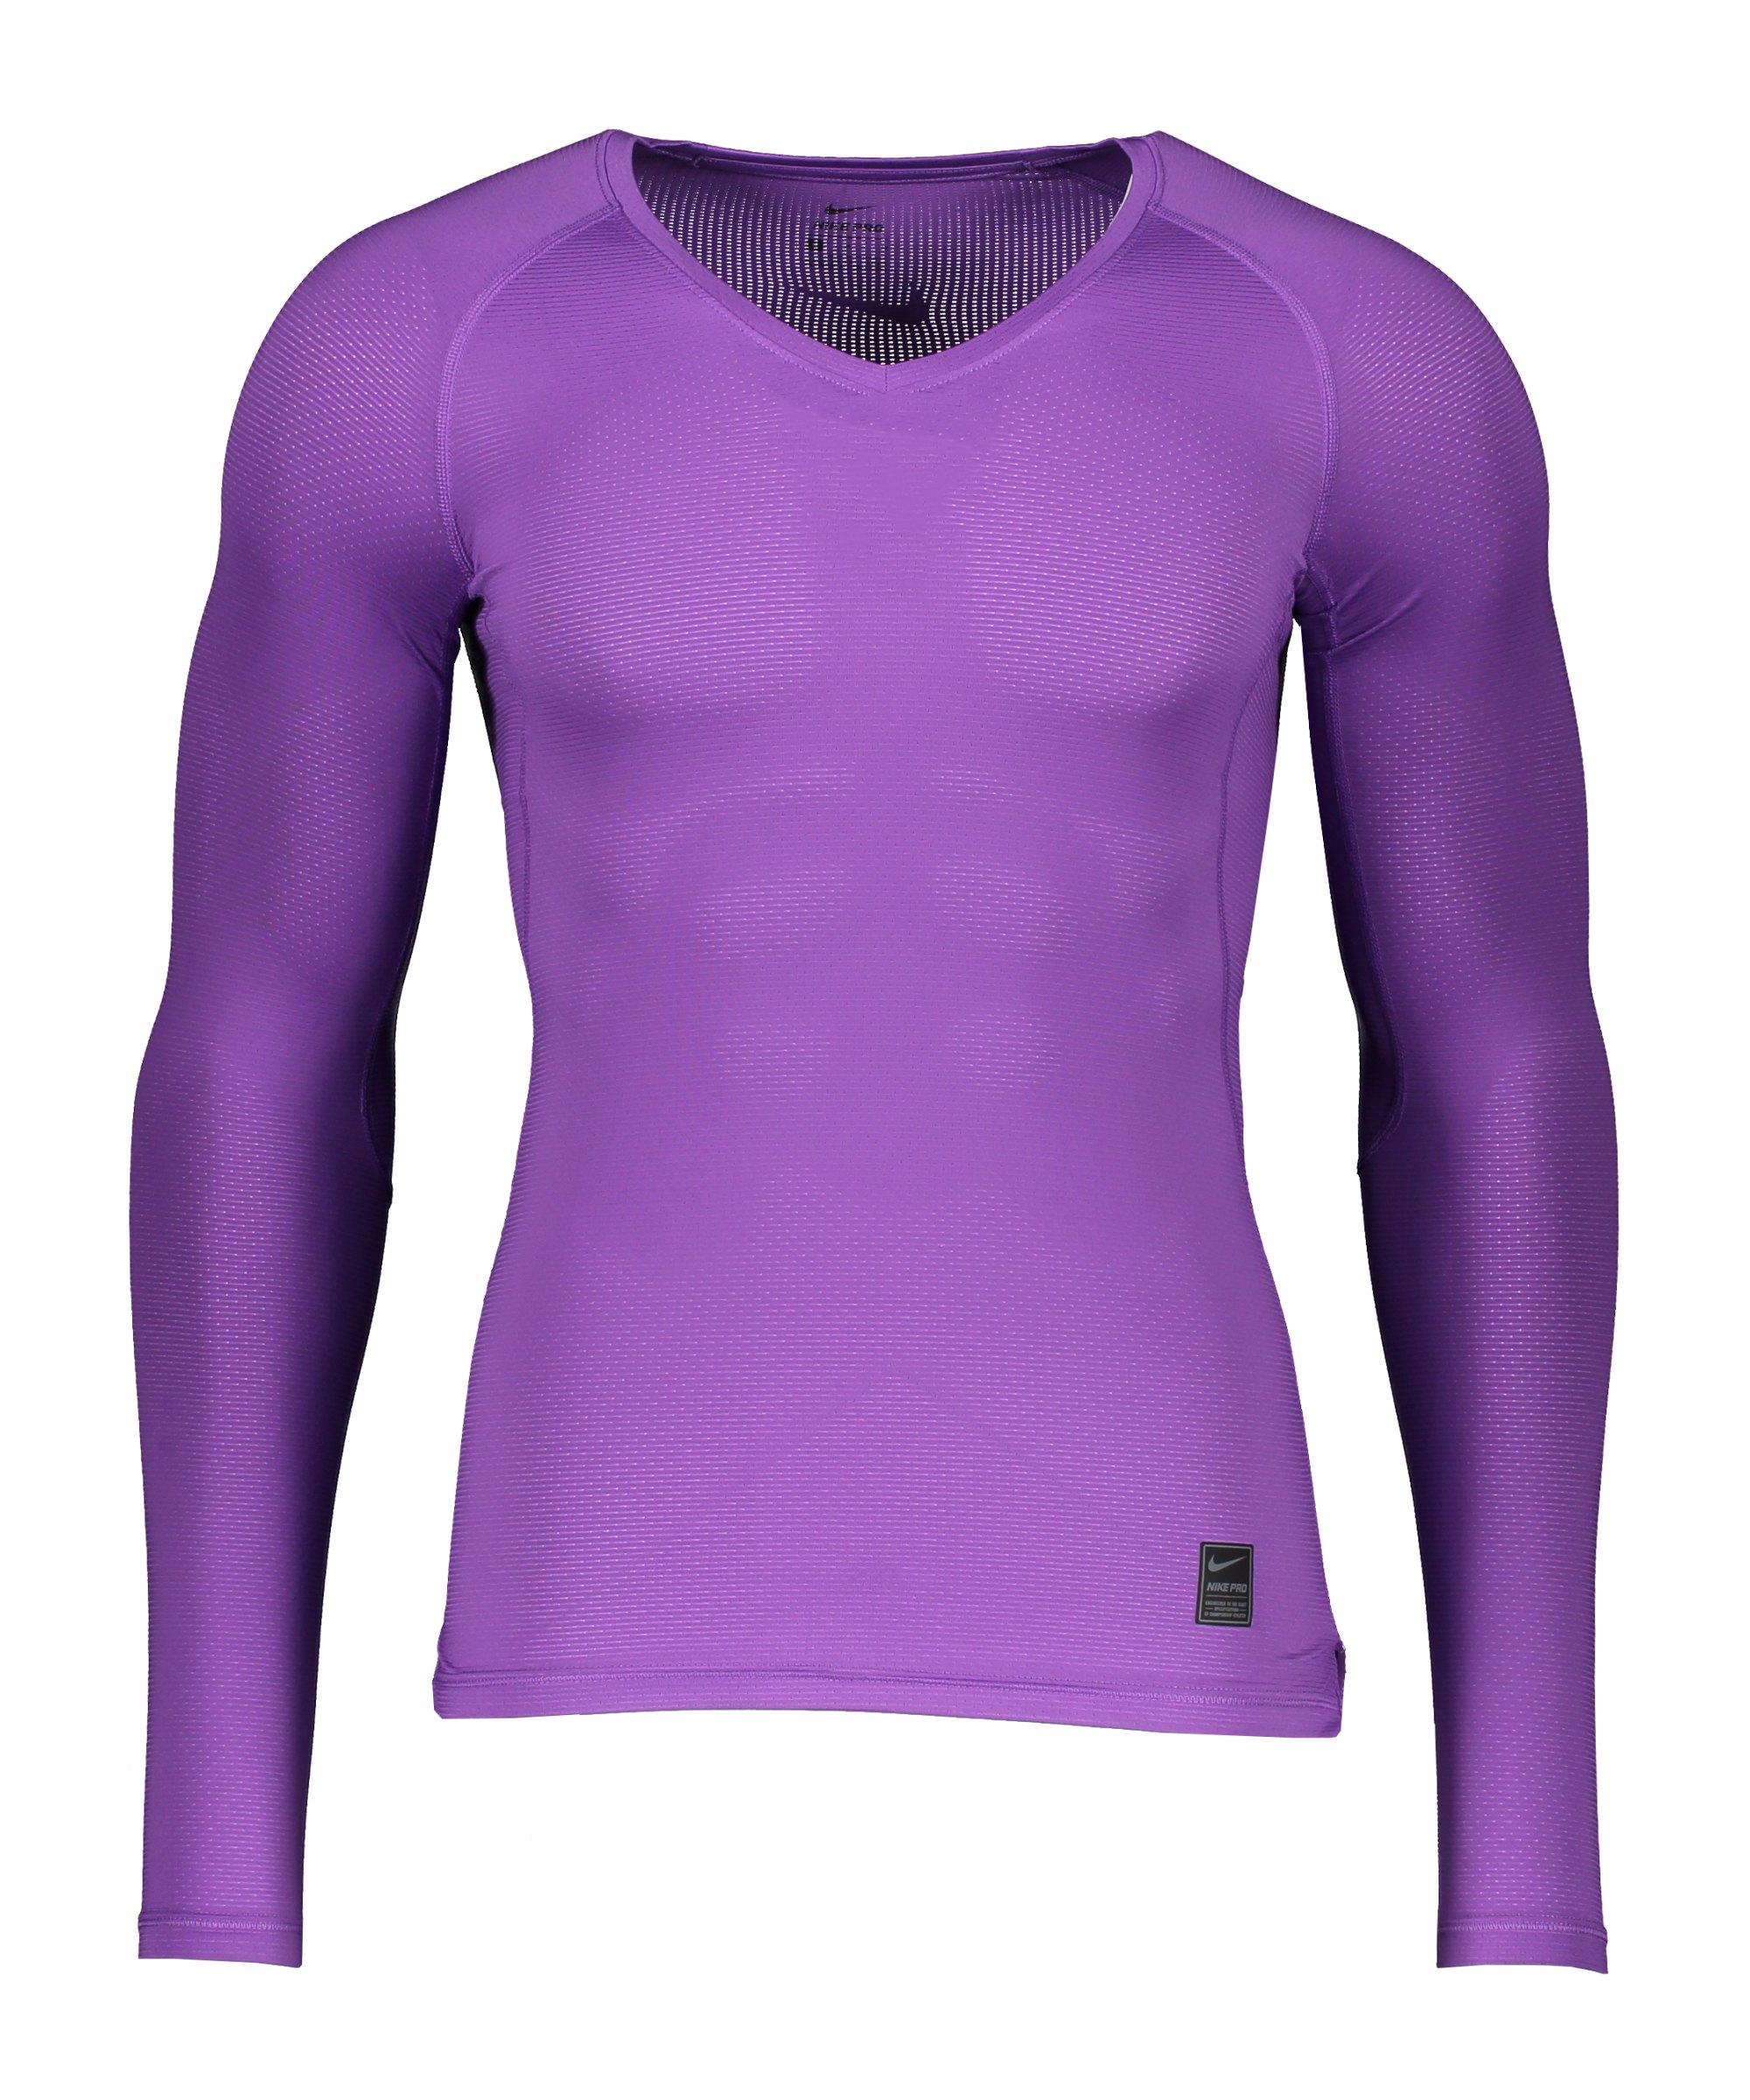 Nike Pro Hypercool Comp Shirt langarm Lila F528 - lila